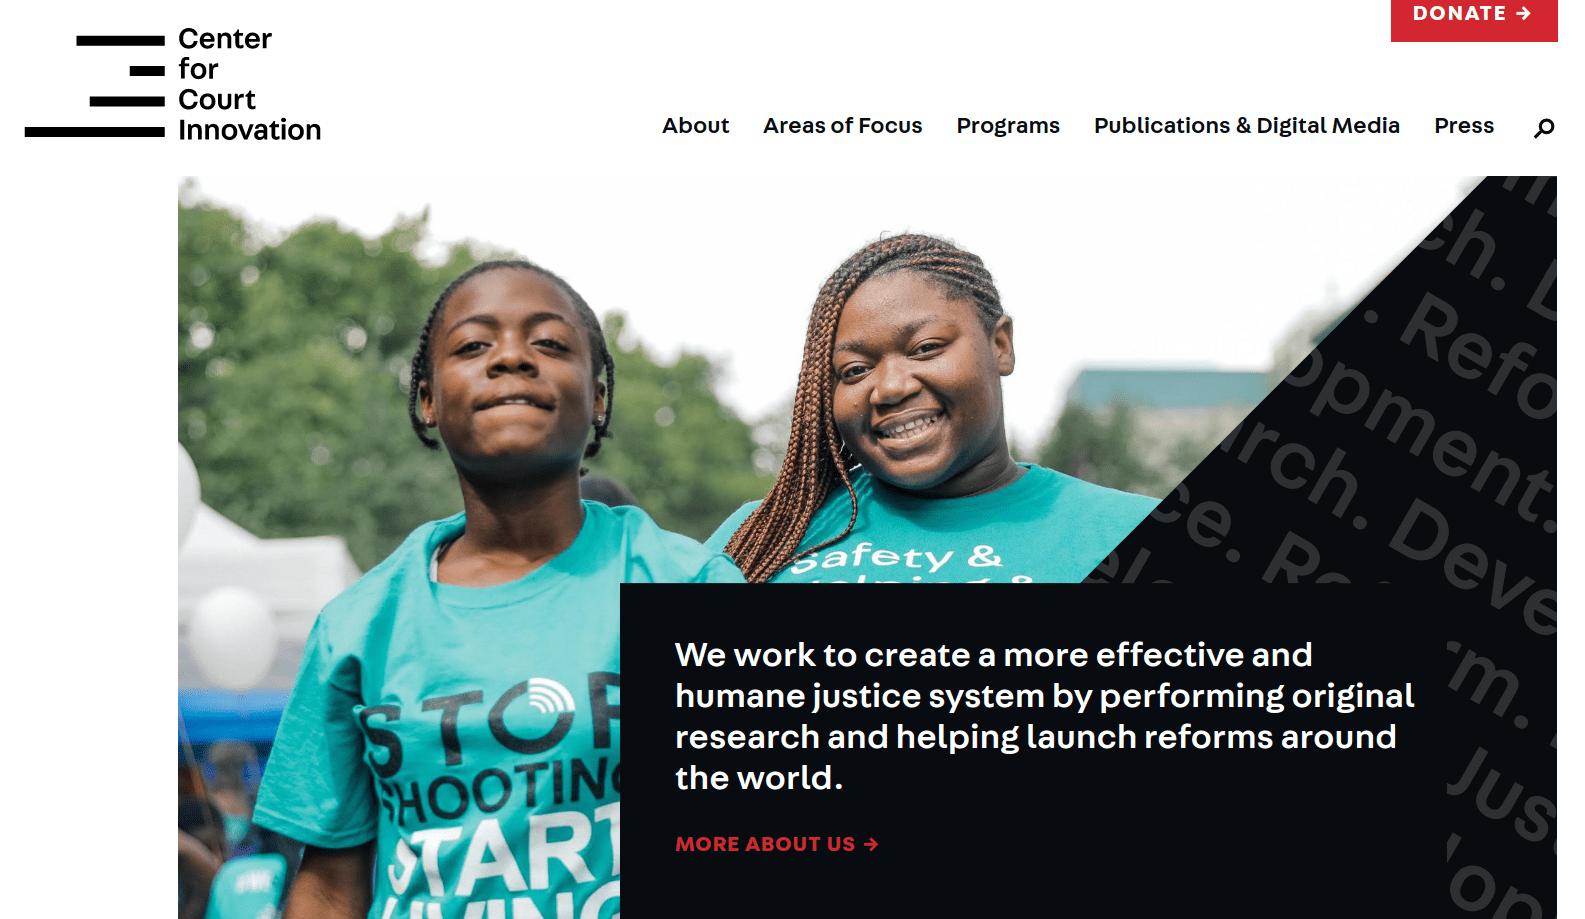 courtinnovation.org website